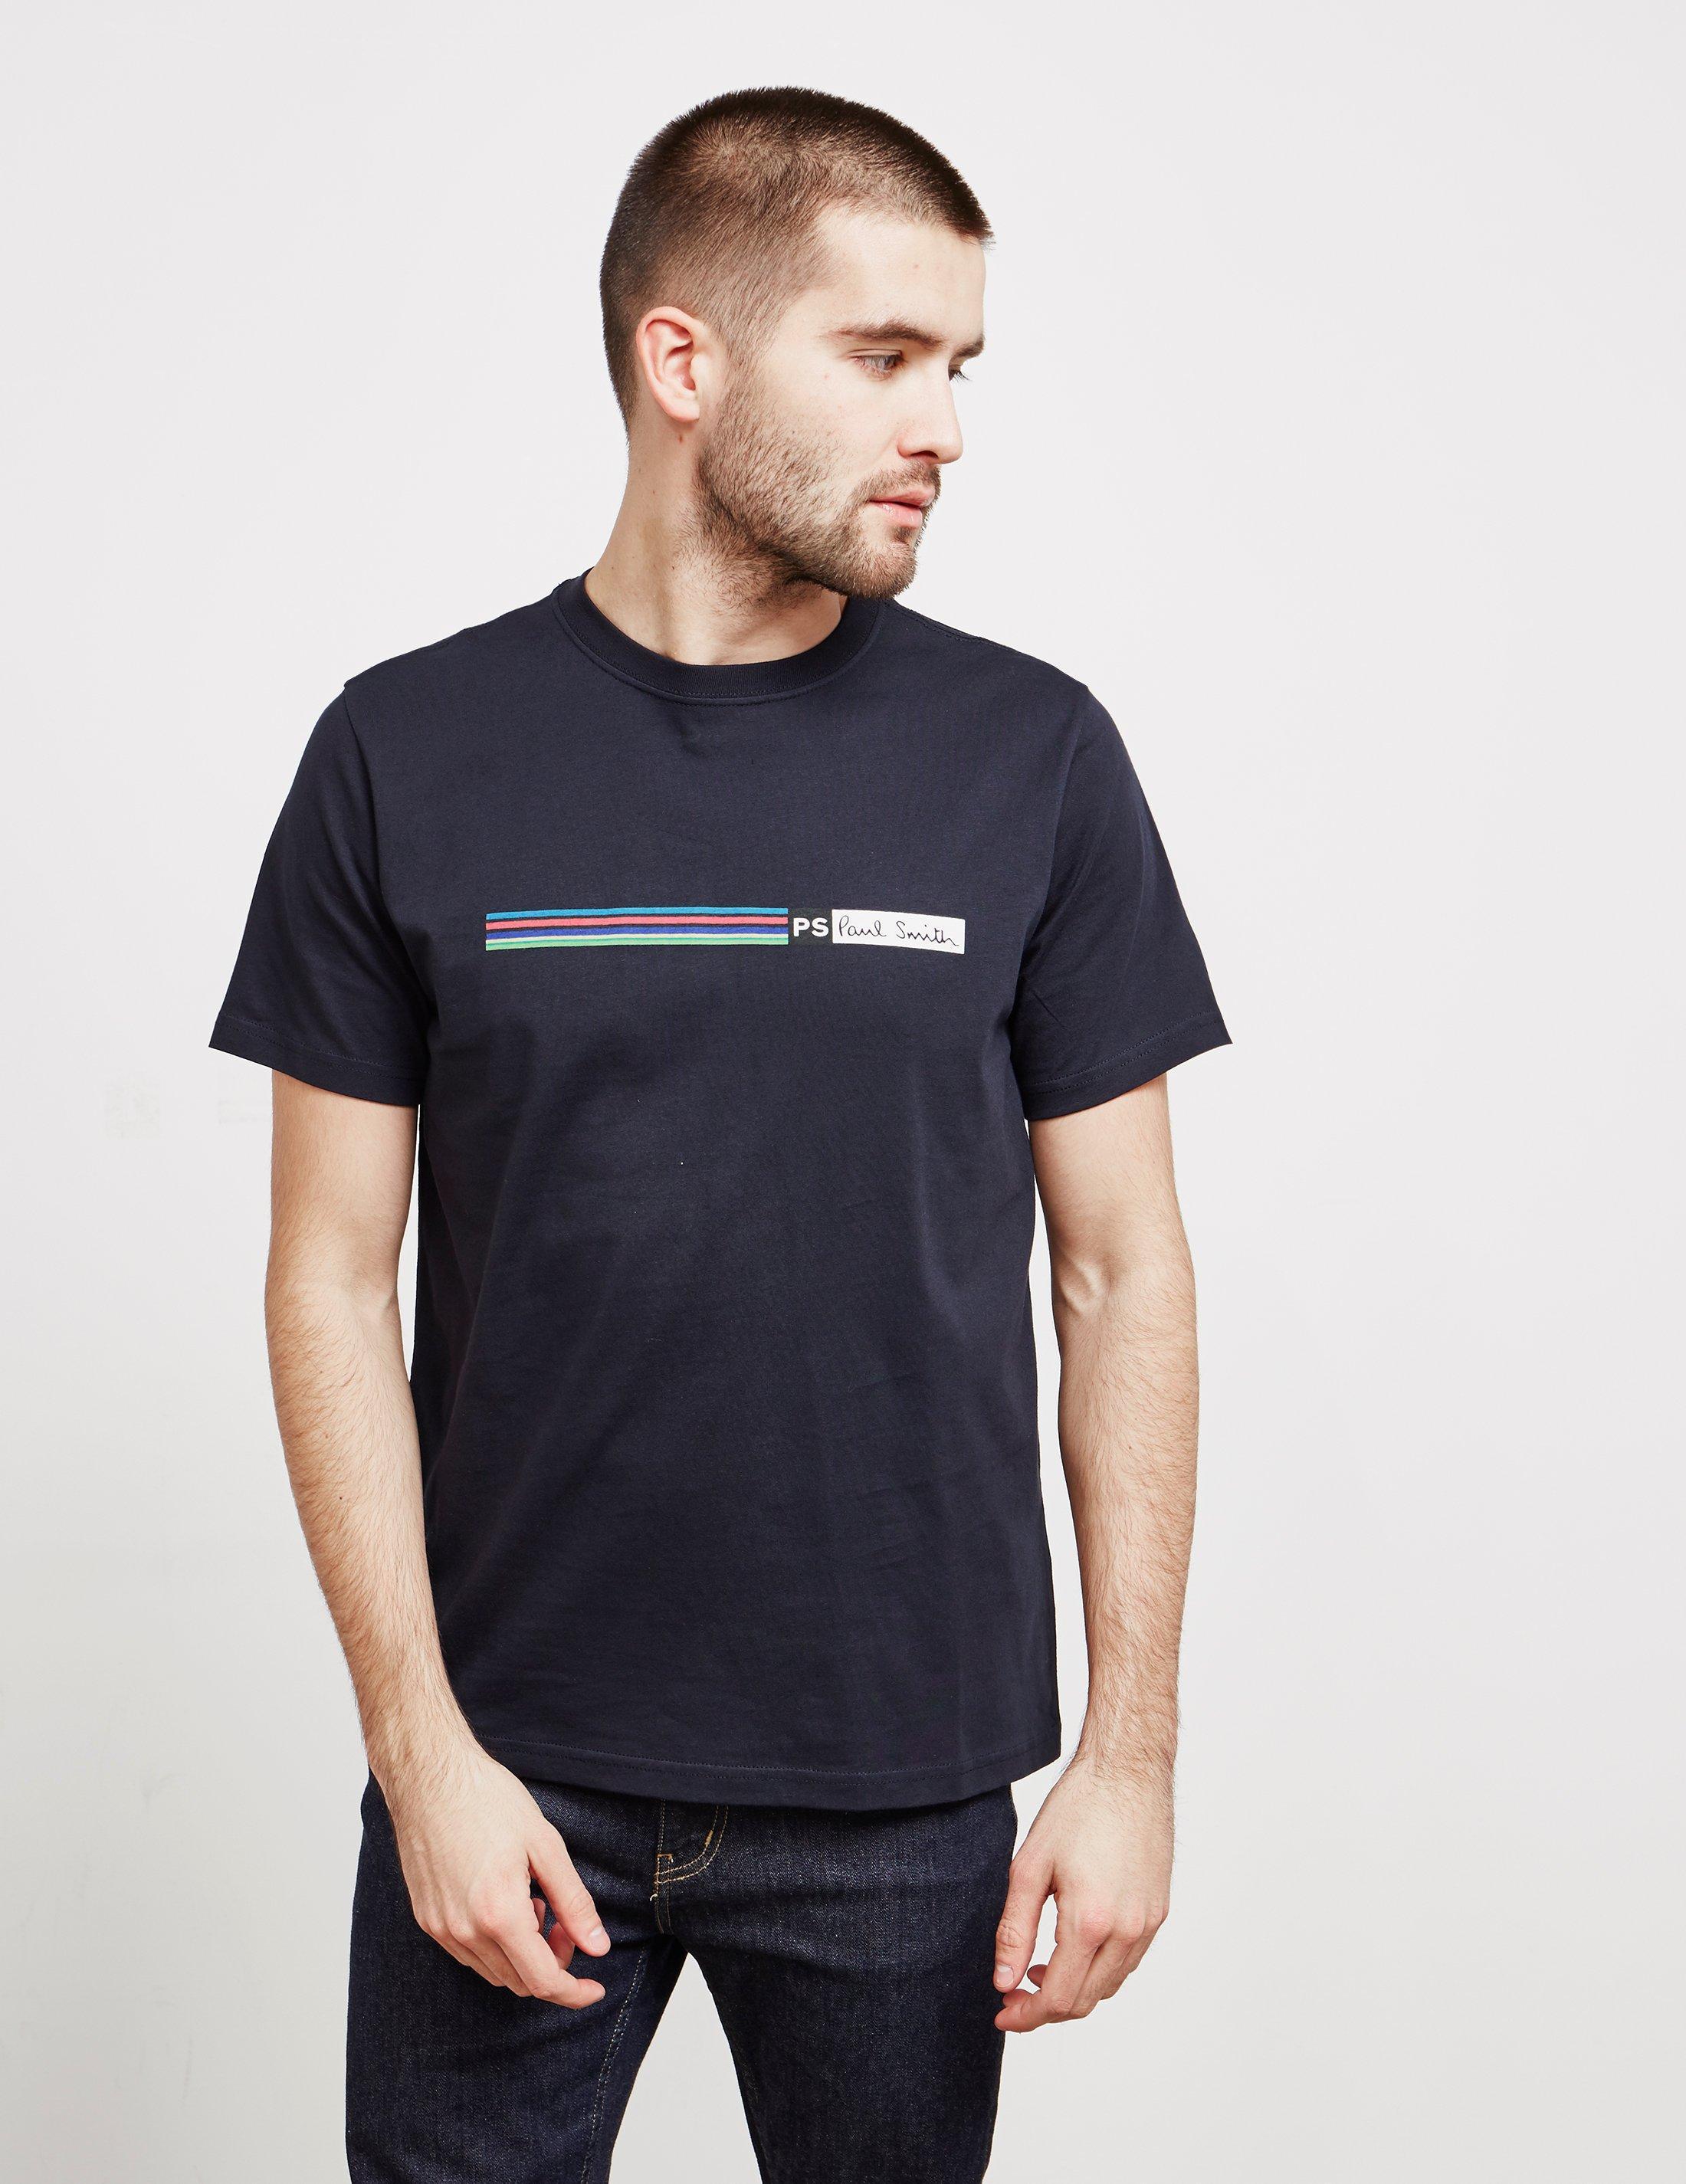 5f176d5b30 Lyst - PS by Paul Smith Multi Stripe Short Sleeve T-shirt Navy Blue ...